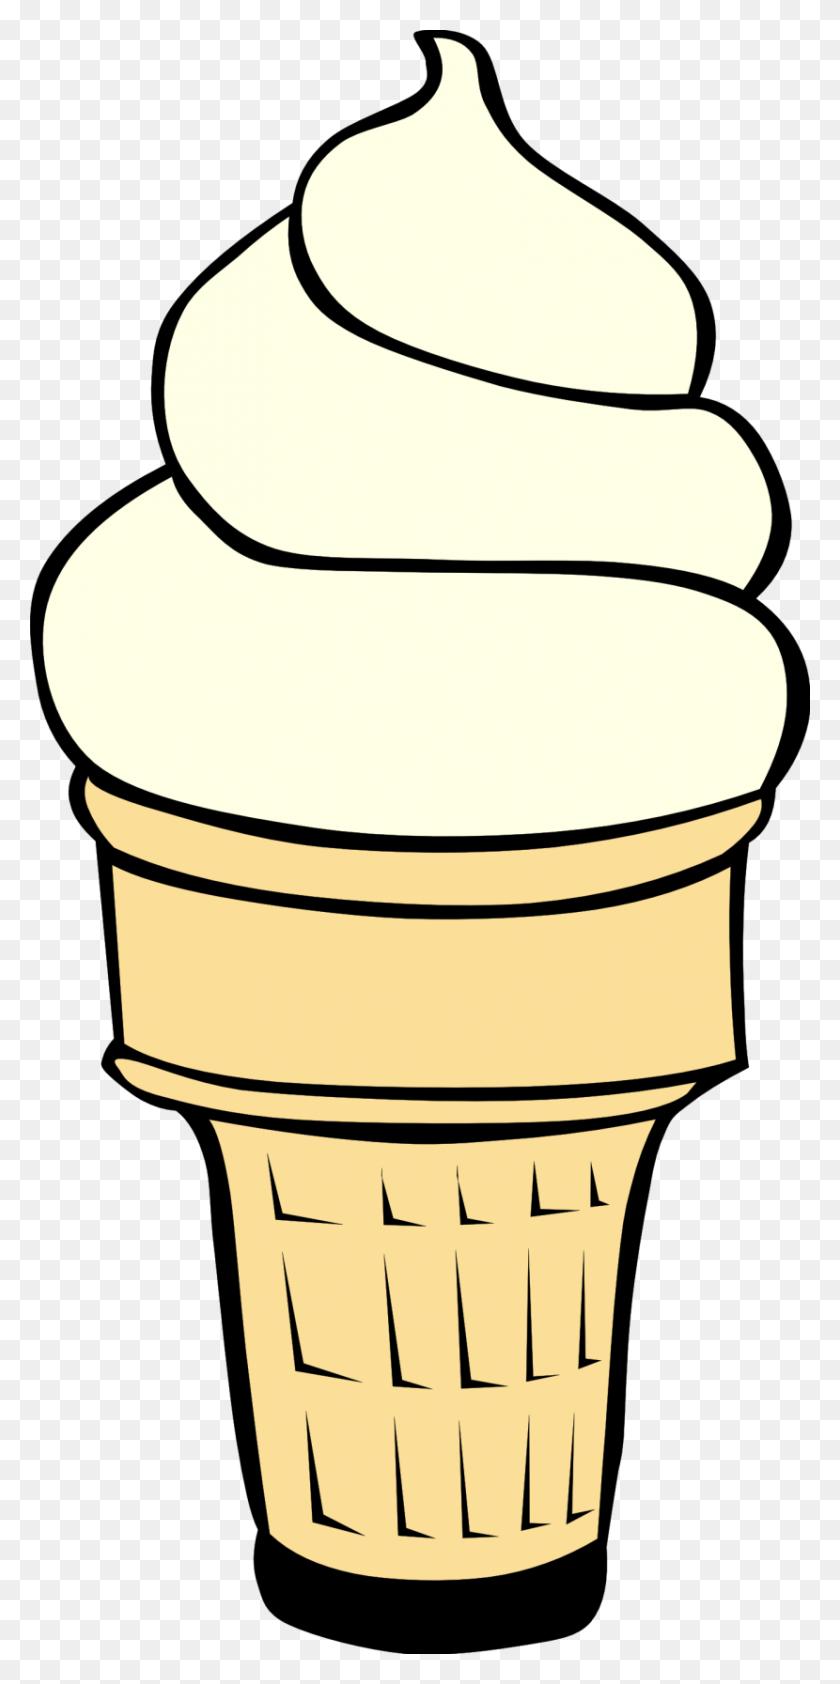 Ice Cream Free Ice Cream Social Clip Art - Social Clip Art